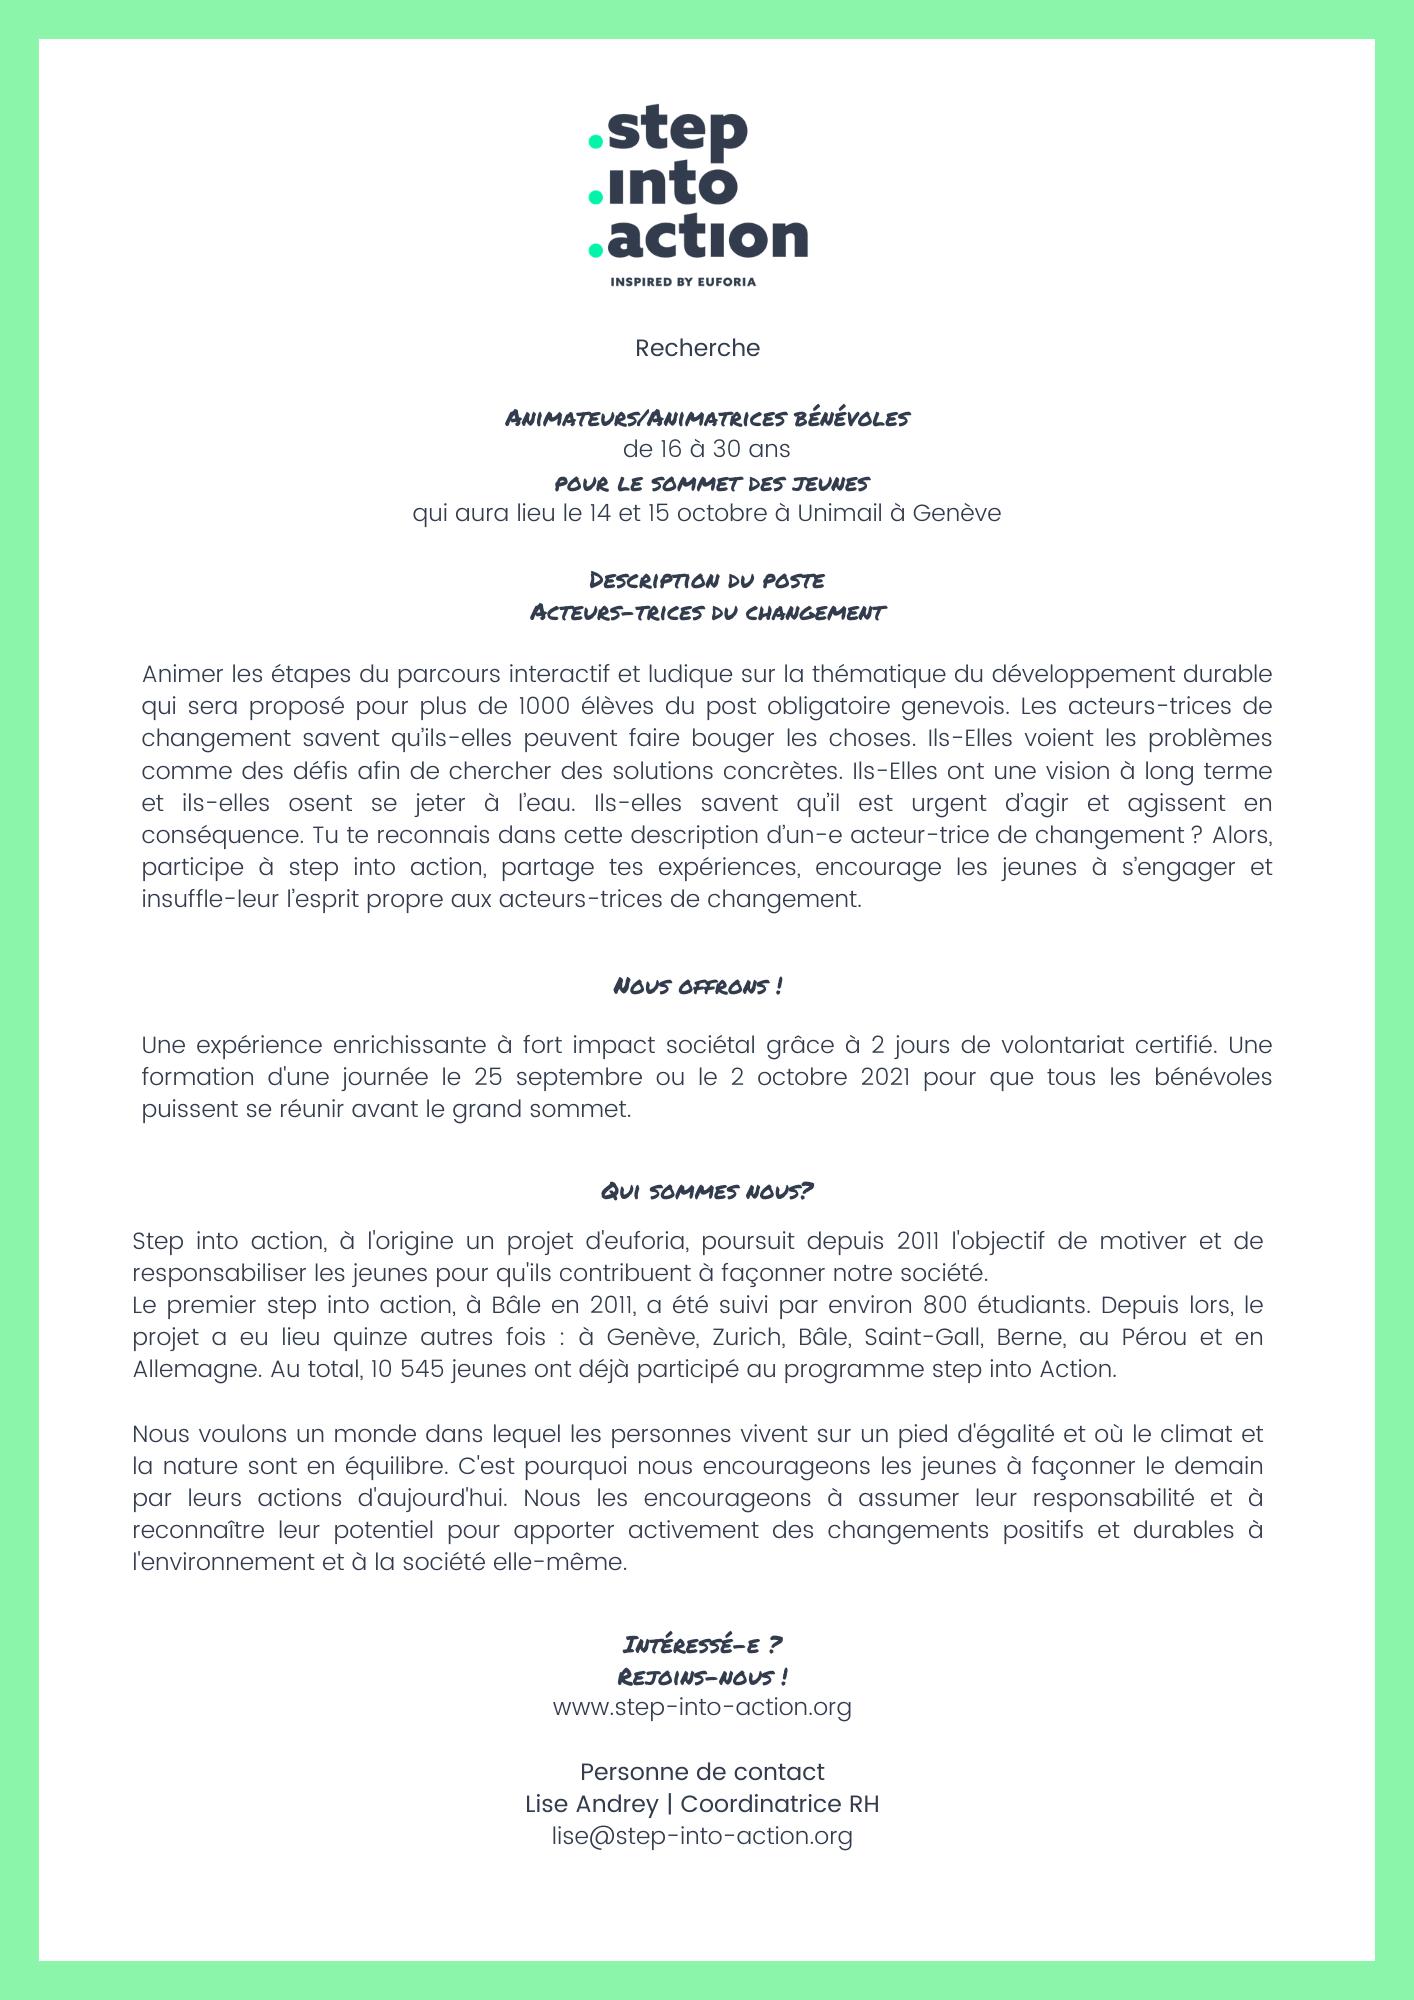 Annonce_step into action_octobre 2021_Genève